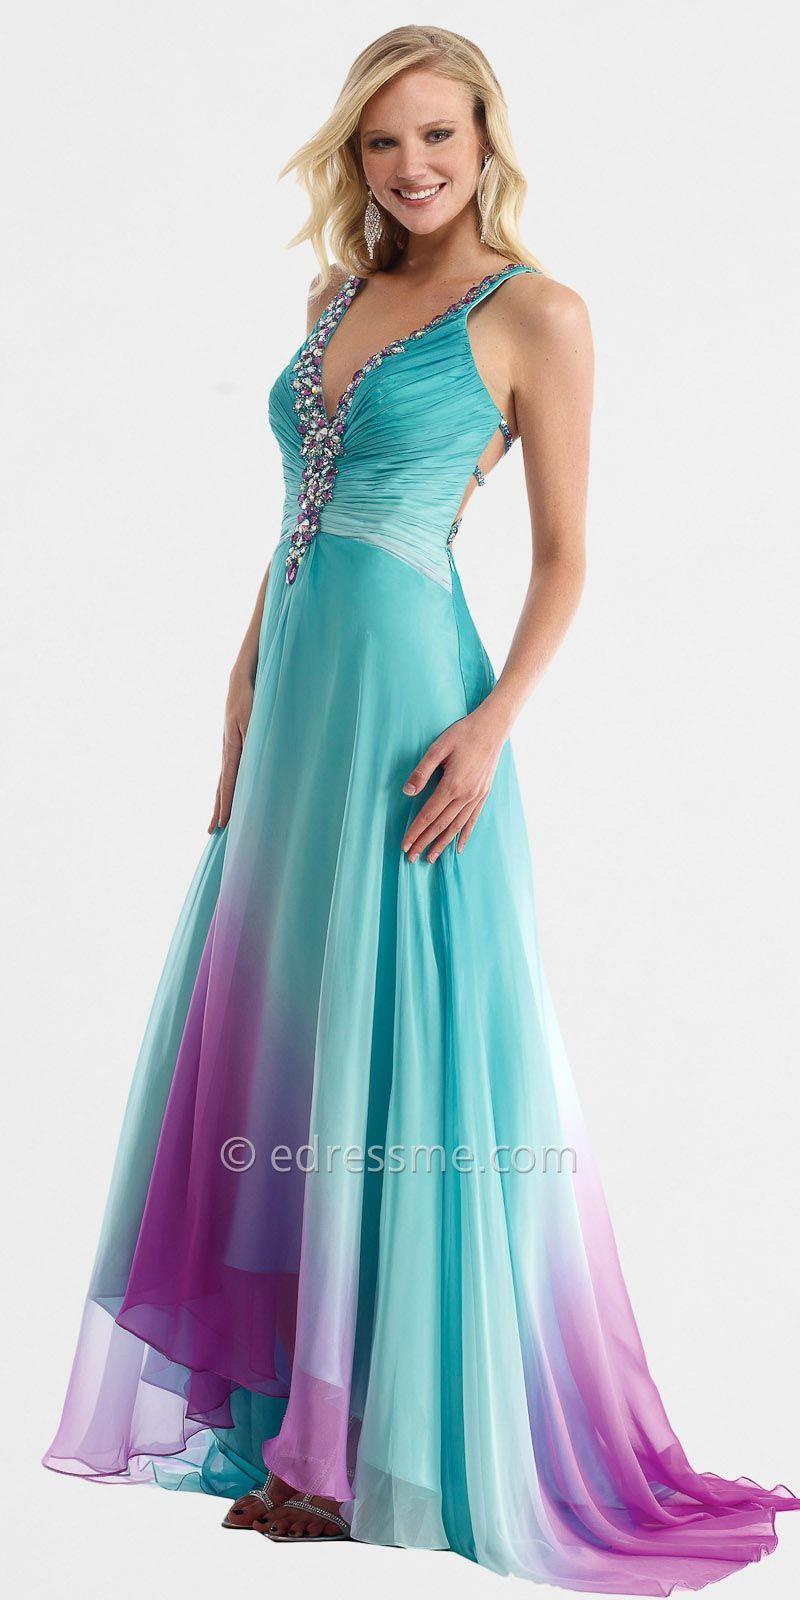 Dye wedding dress after wedding  Tie Dye Dress aqua and purple for outdoor wedding fun  Weddings